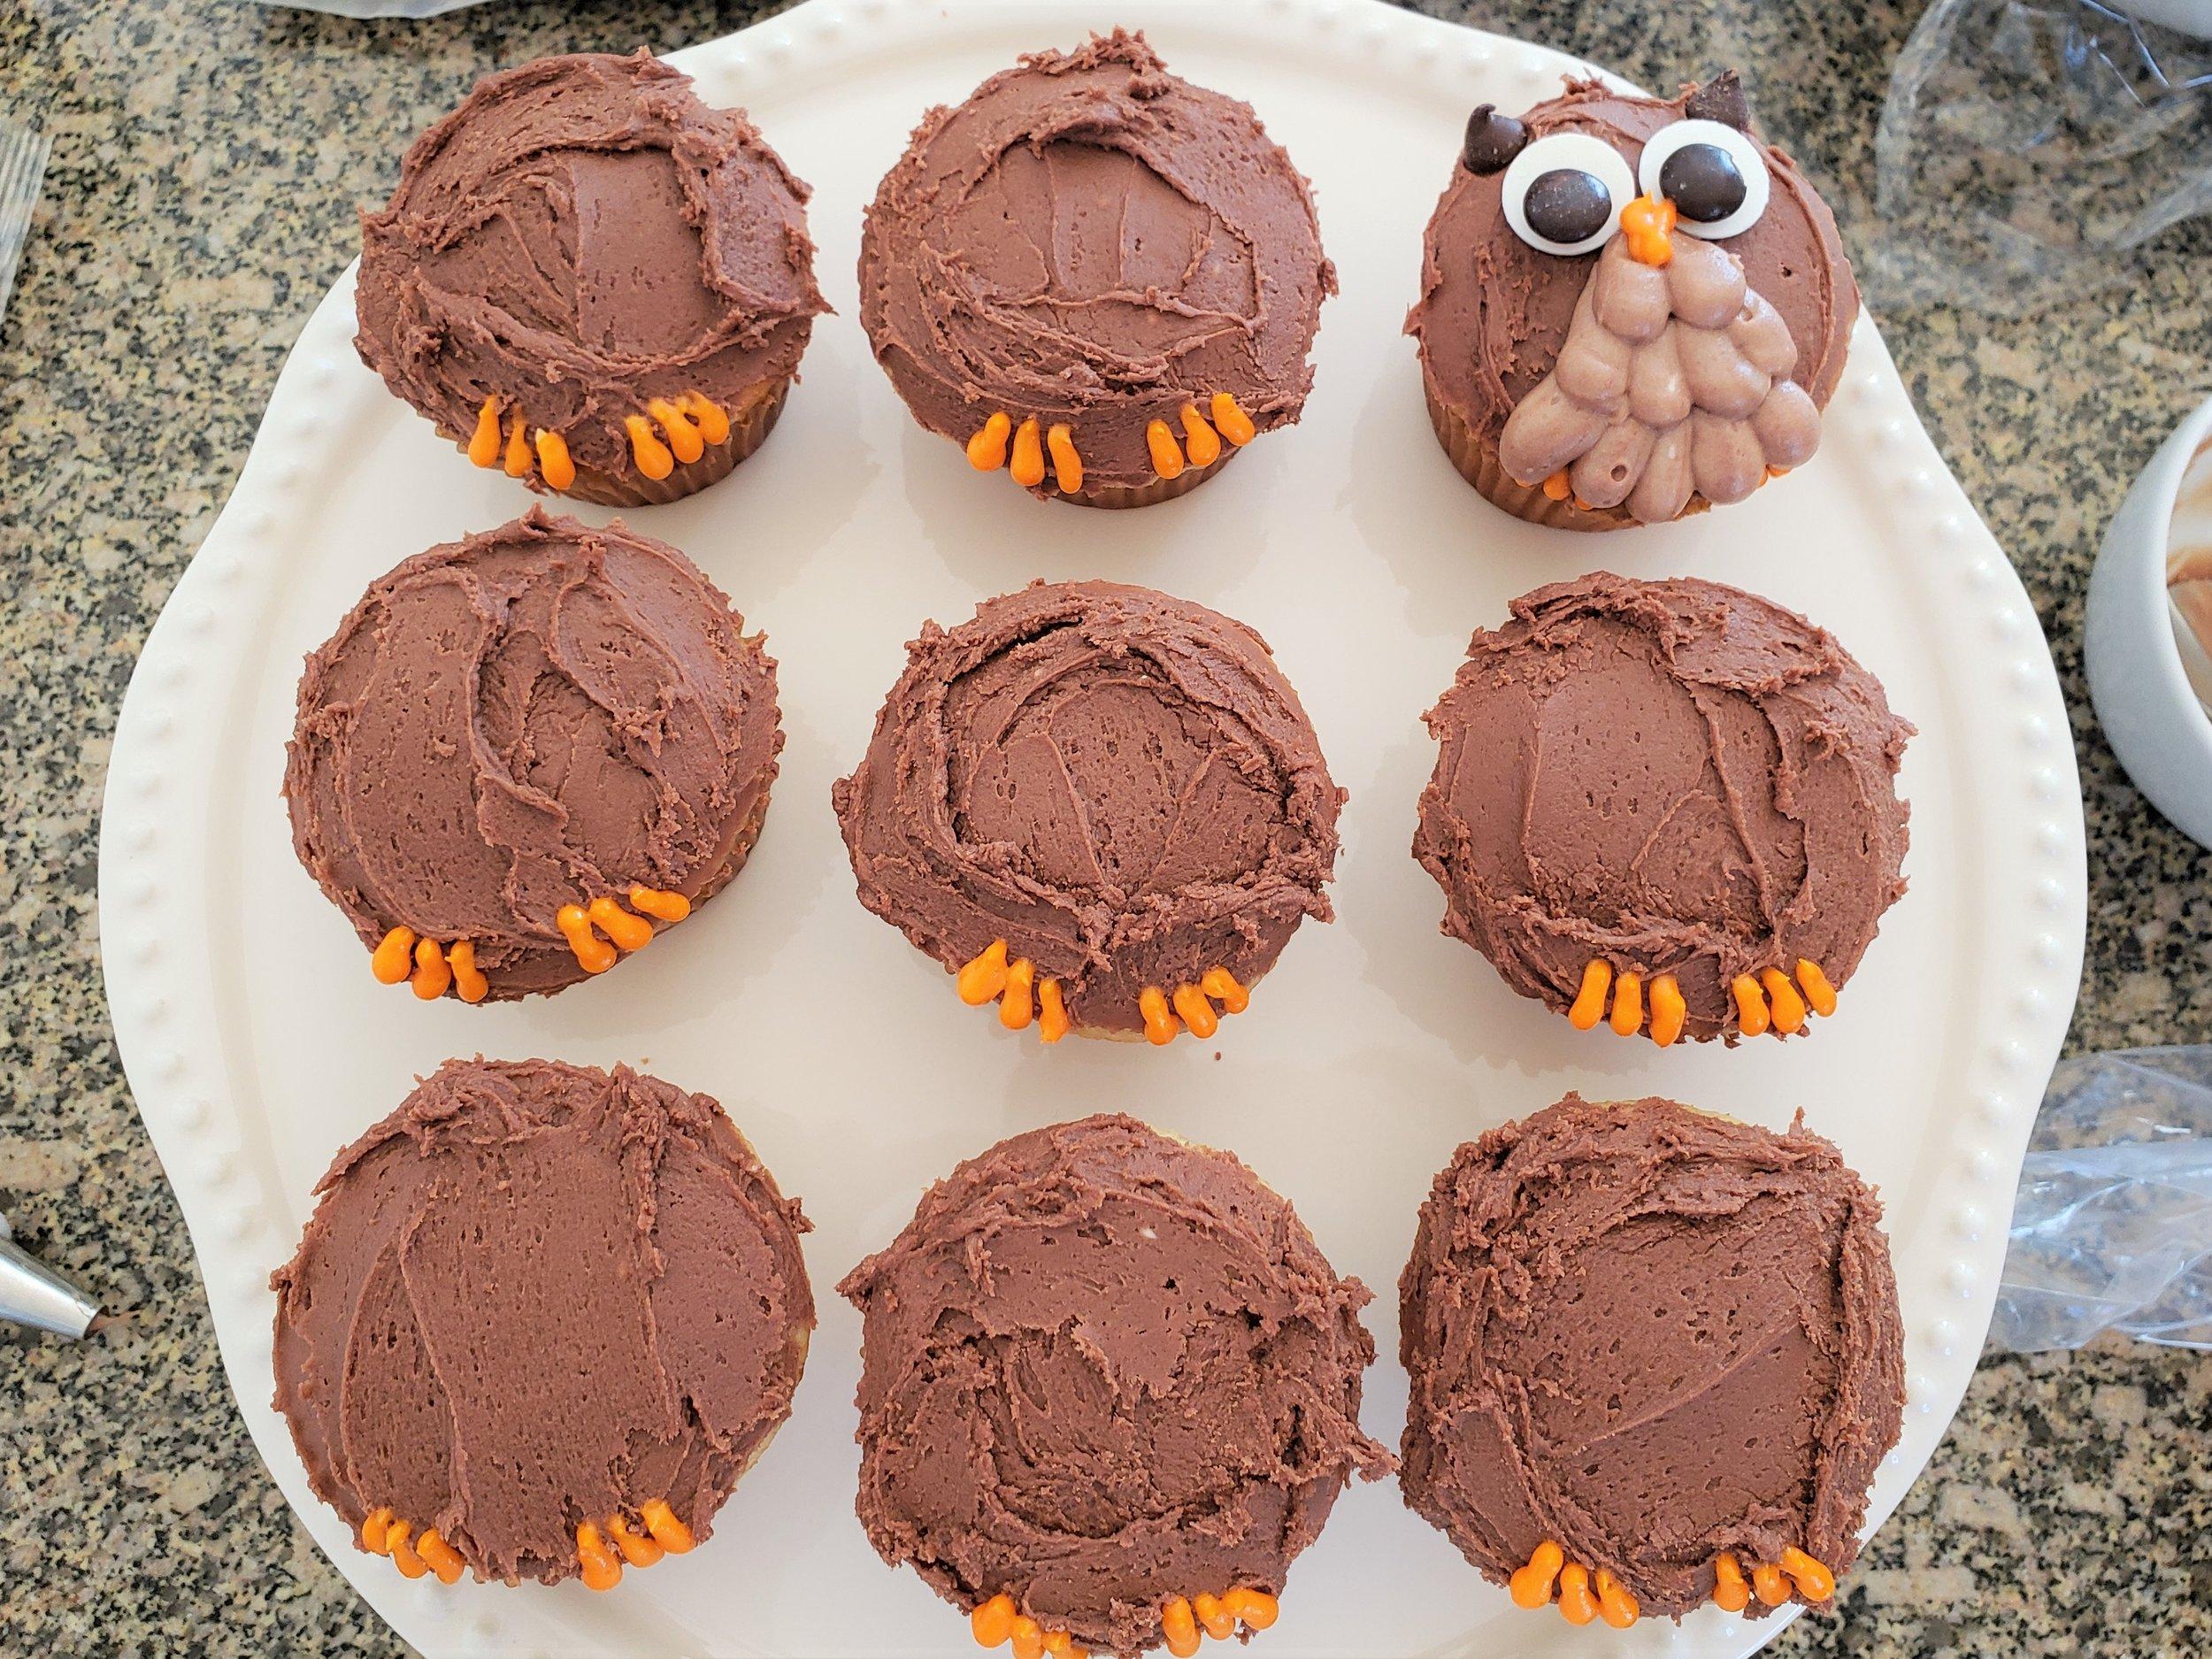 Owl tree cupcake cake: add talons